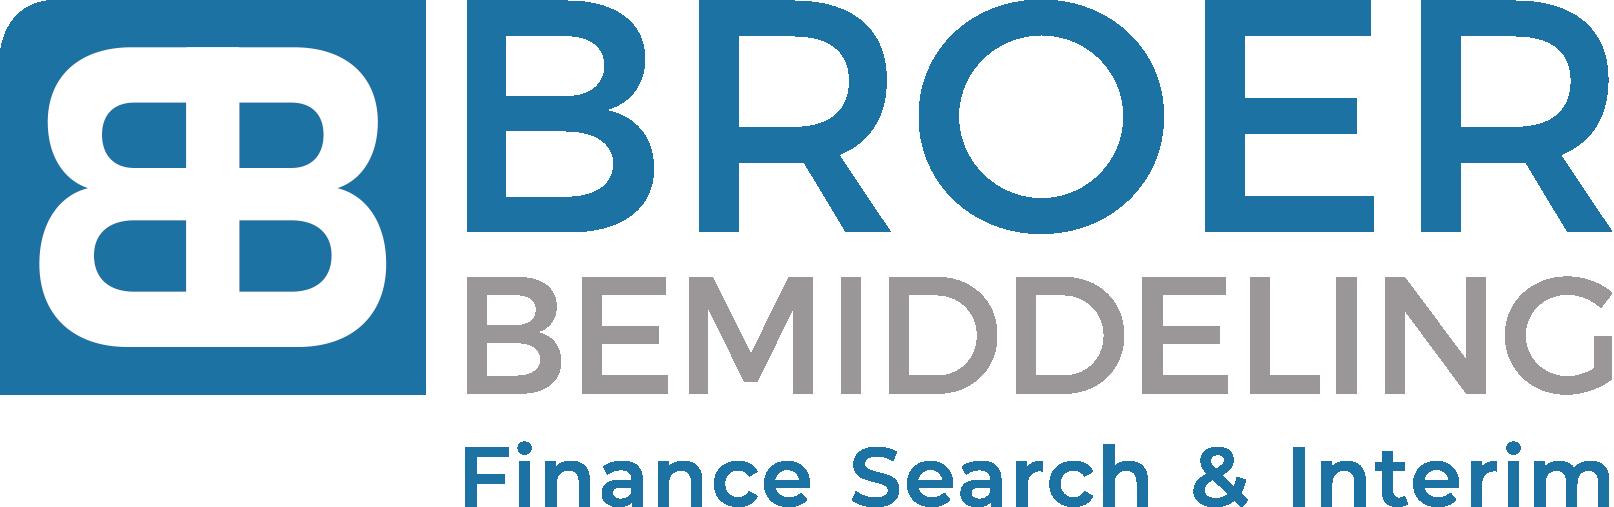 bb-logo-ondertitel